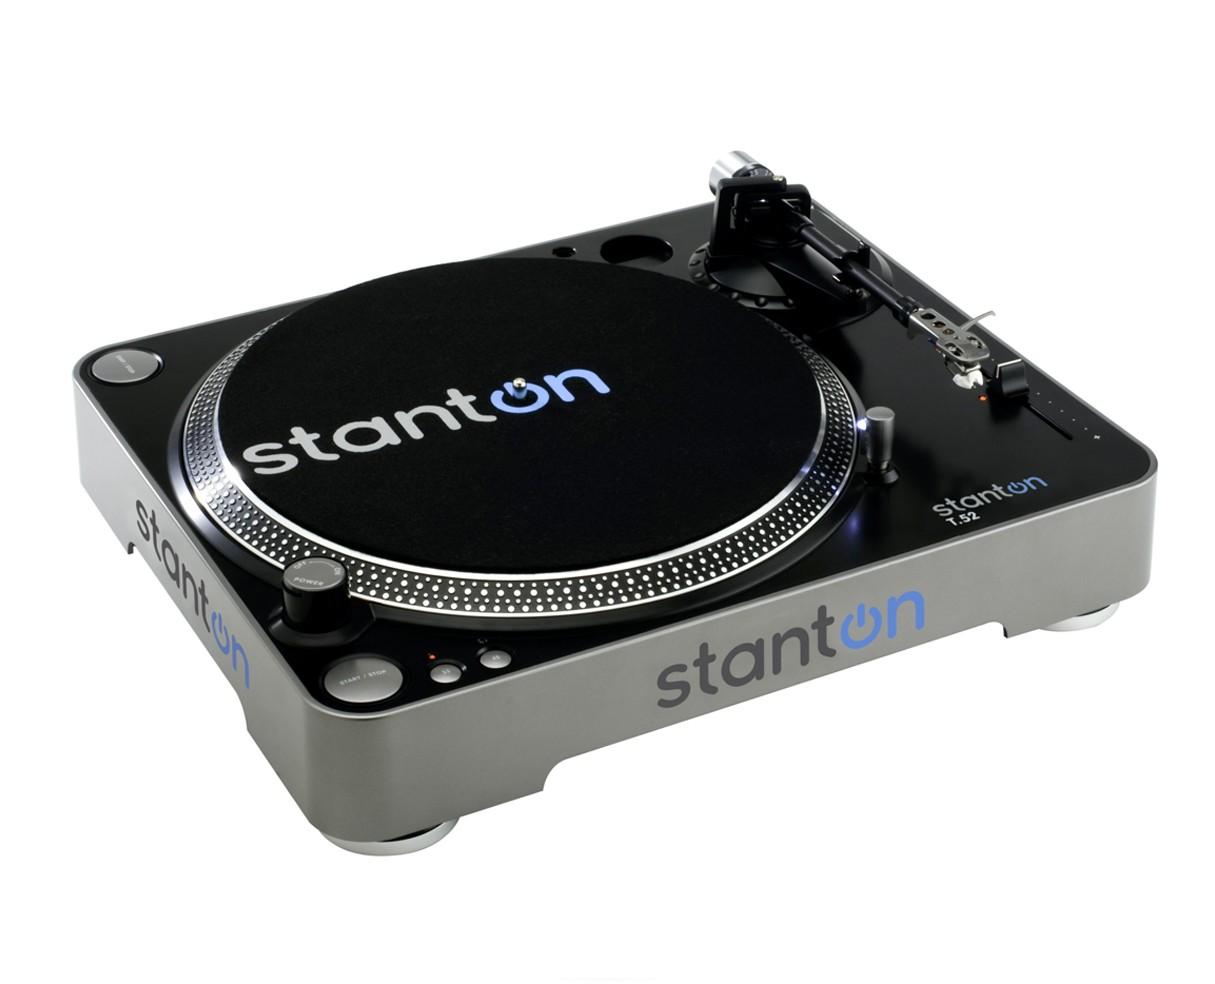 Stanton T 52B Belt Driven DJ Turntable